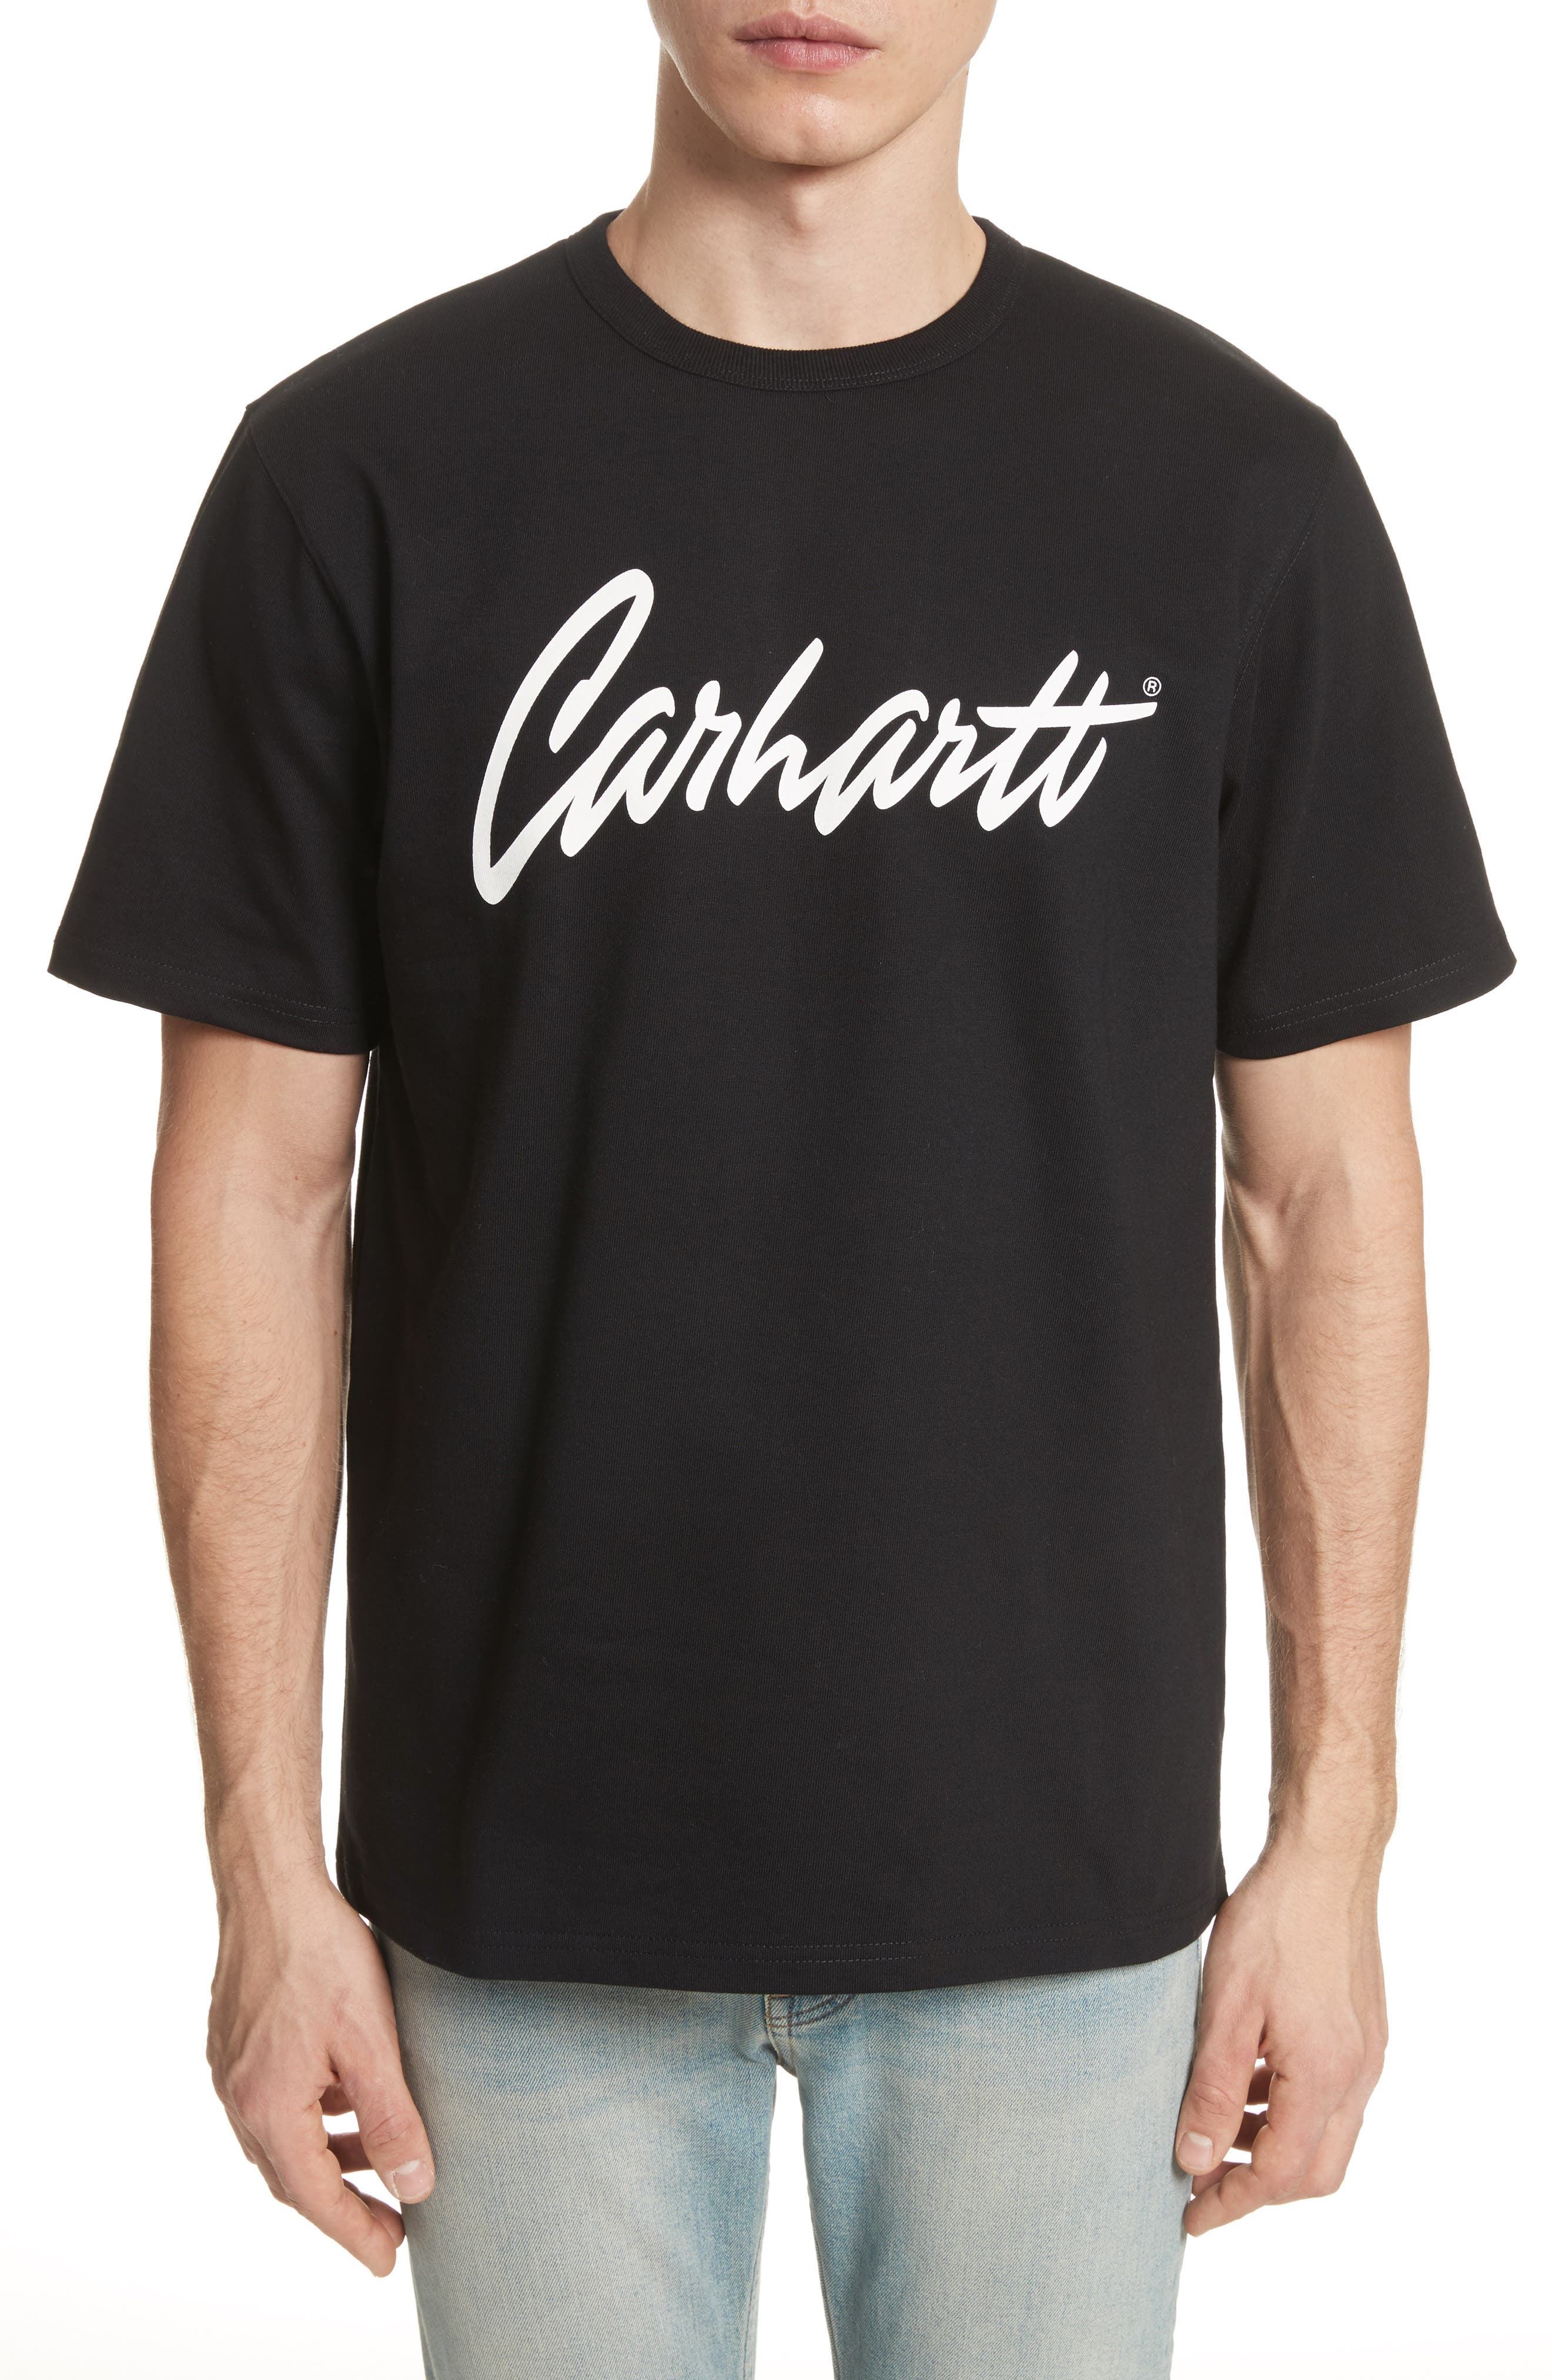 Carhartt Work in Progress Stray Graphic T-Shirt